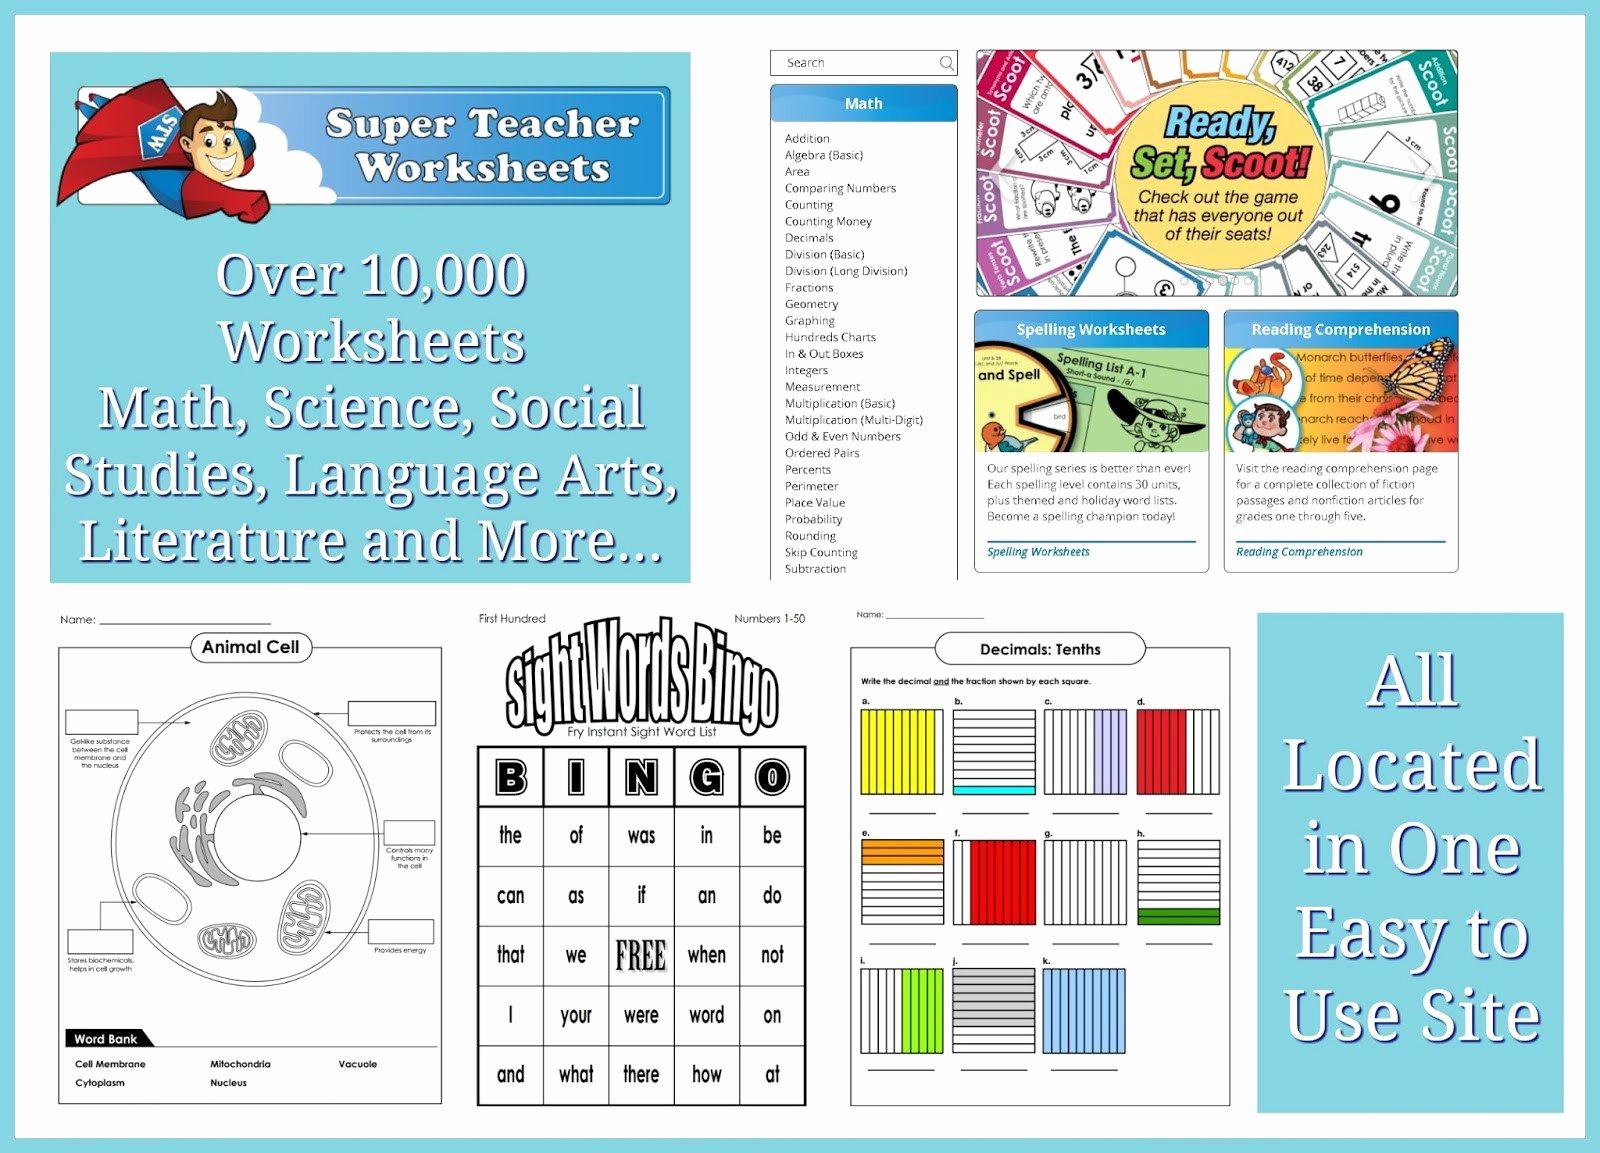 Super Teachers Worksheets Login Luxury 20 Super Teachers Worksheets Login